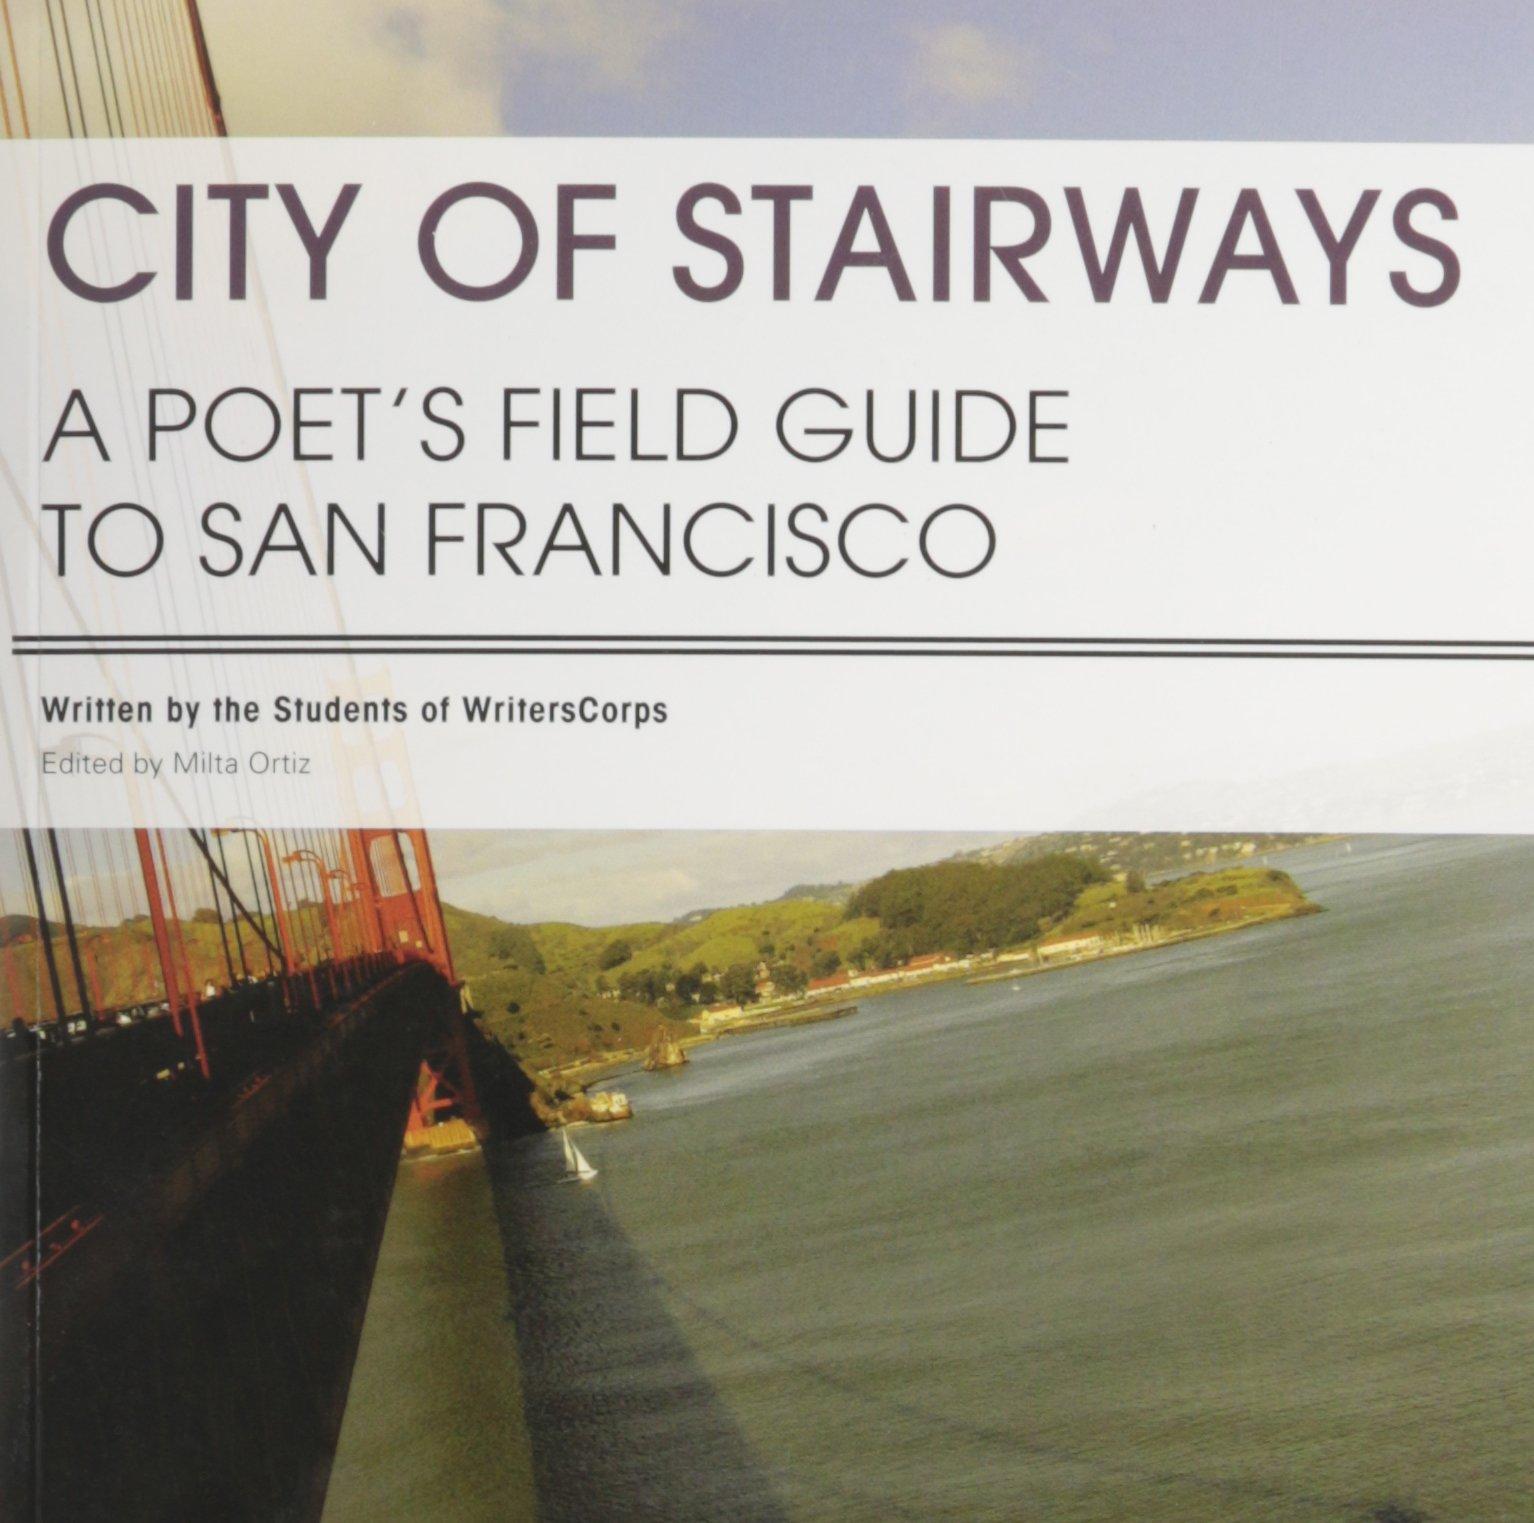 City Of Stairways: A Poetu0027s Field Guide To San Francisco: Milta Ortiz:  9781888048100: Amazon.com: Books